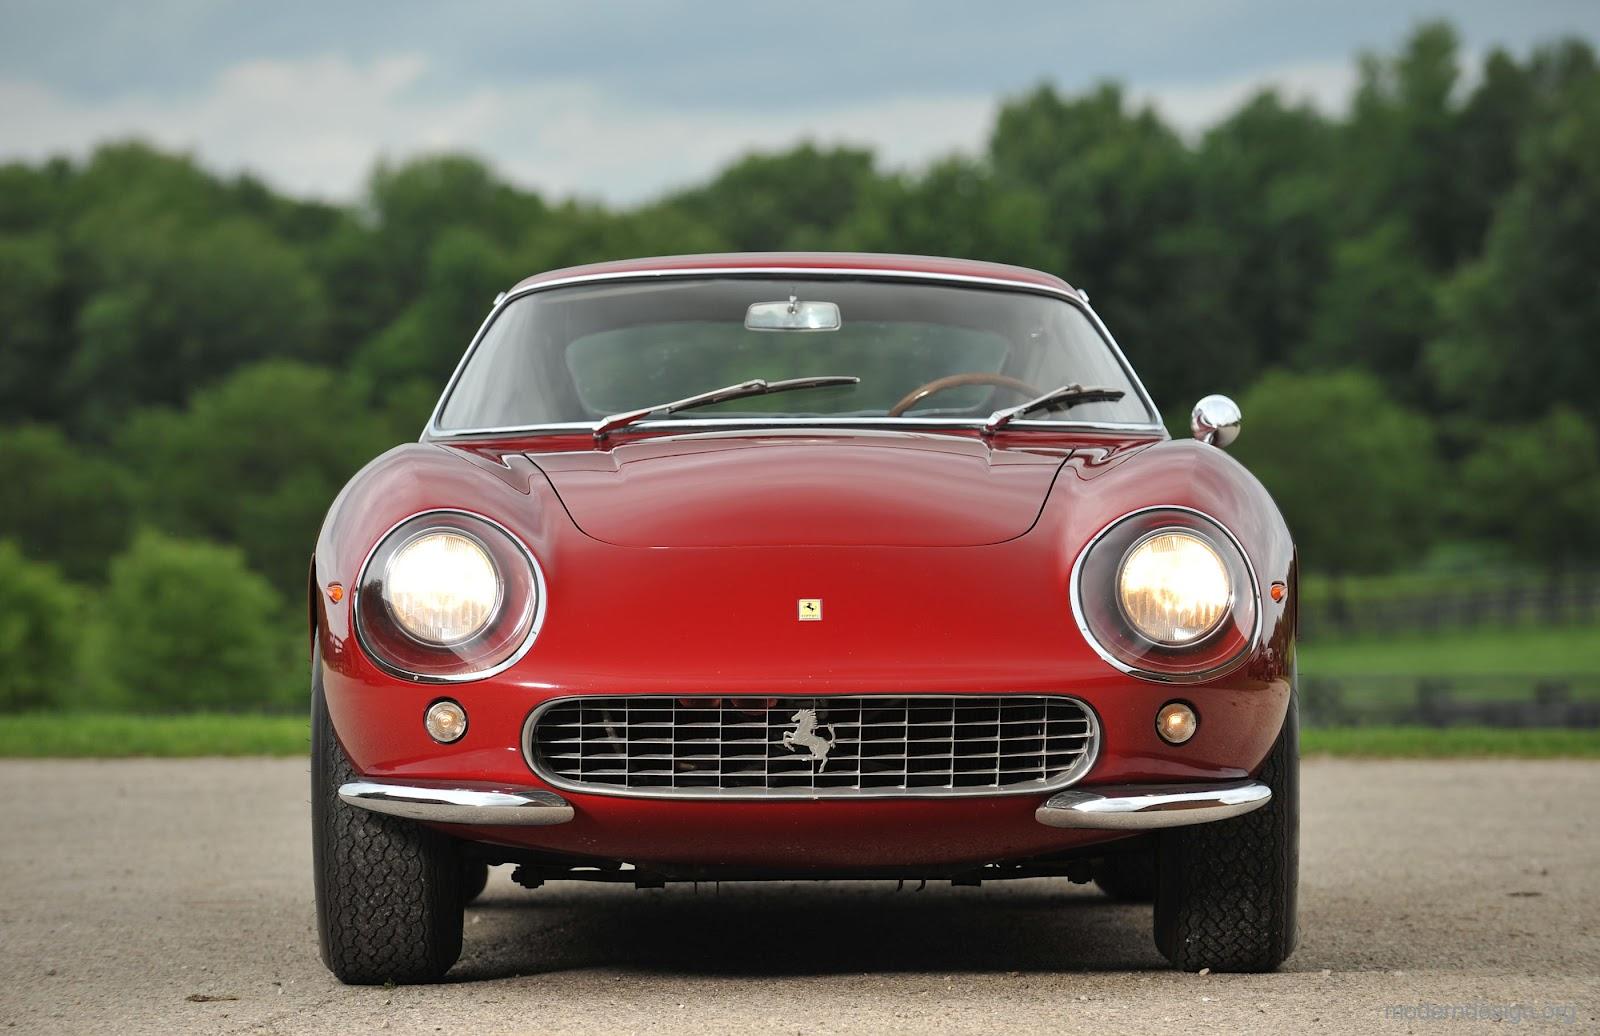 Ferrari 275 gtb berlinetta from 1965 modern design by anatomy of a classic vanachro Images